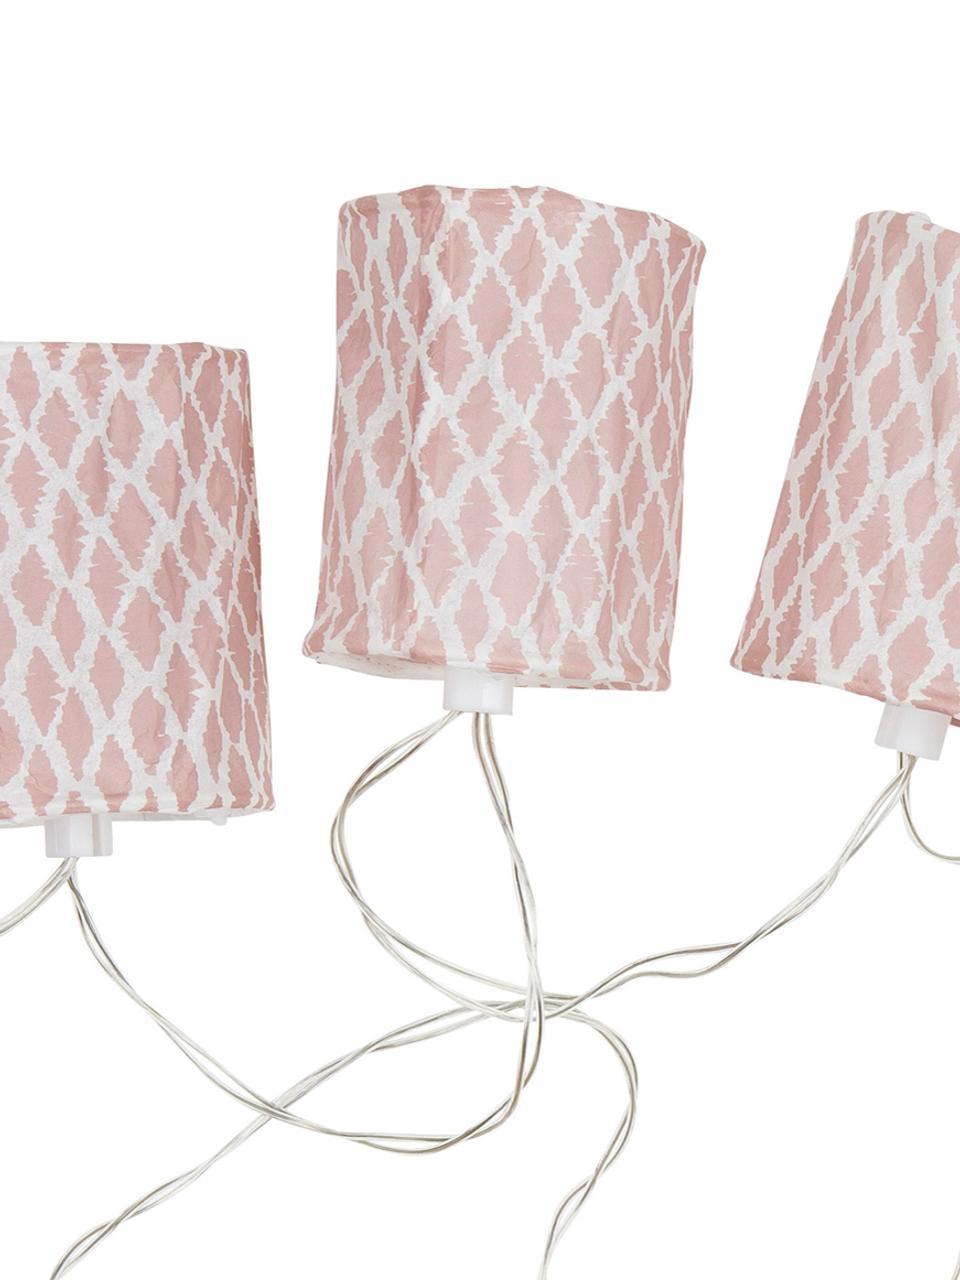 LED-Lichterkette Mosaic, 210 cm, Papier, Kunststoff, Weiß, Pink, L 210 cm